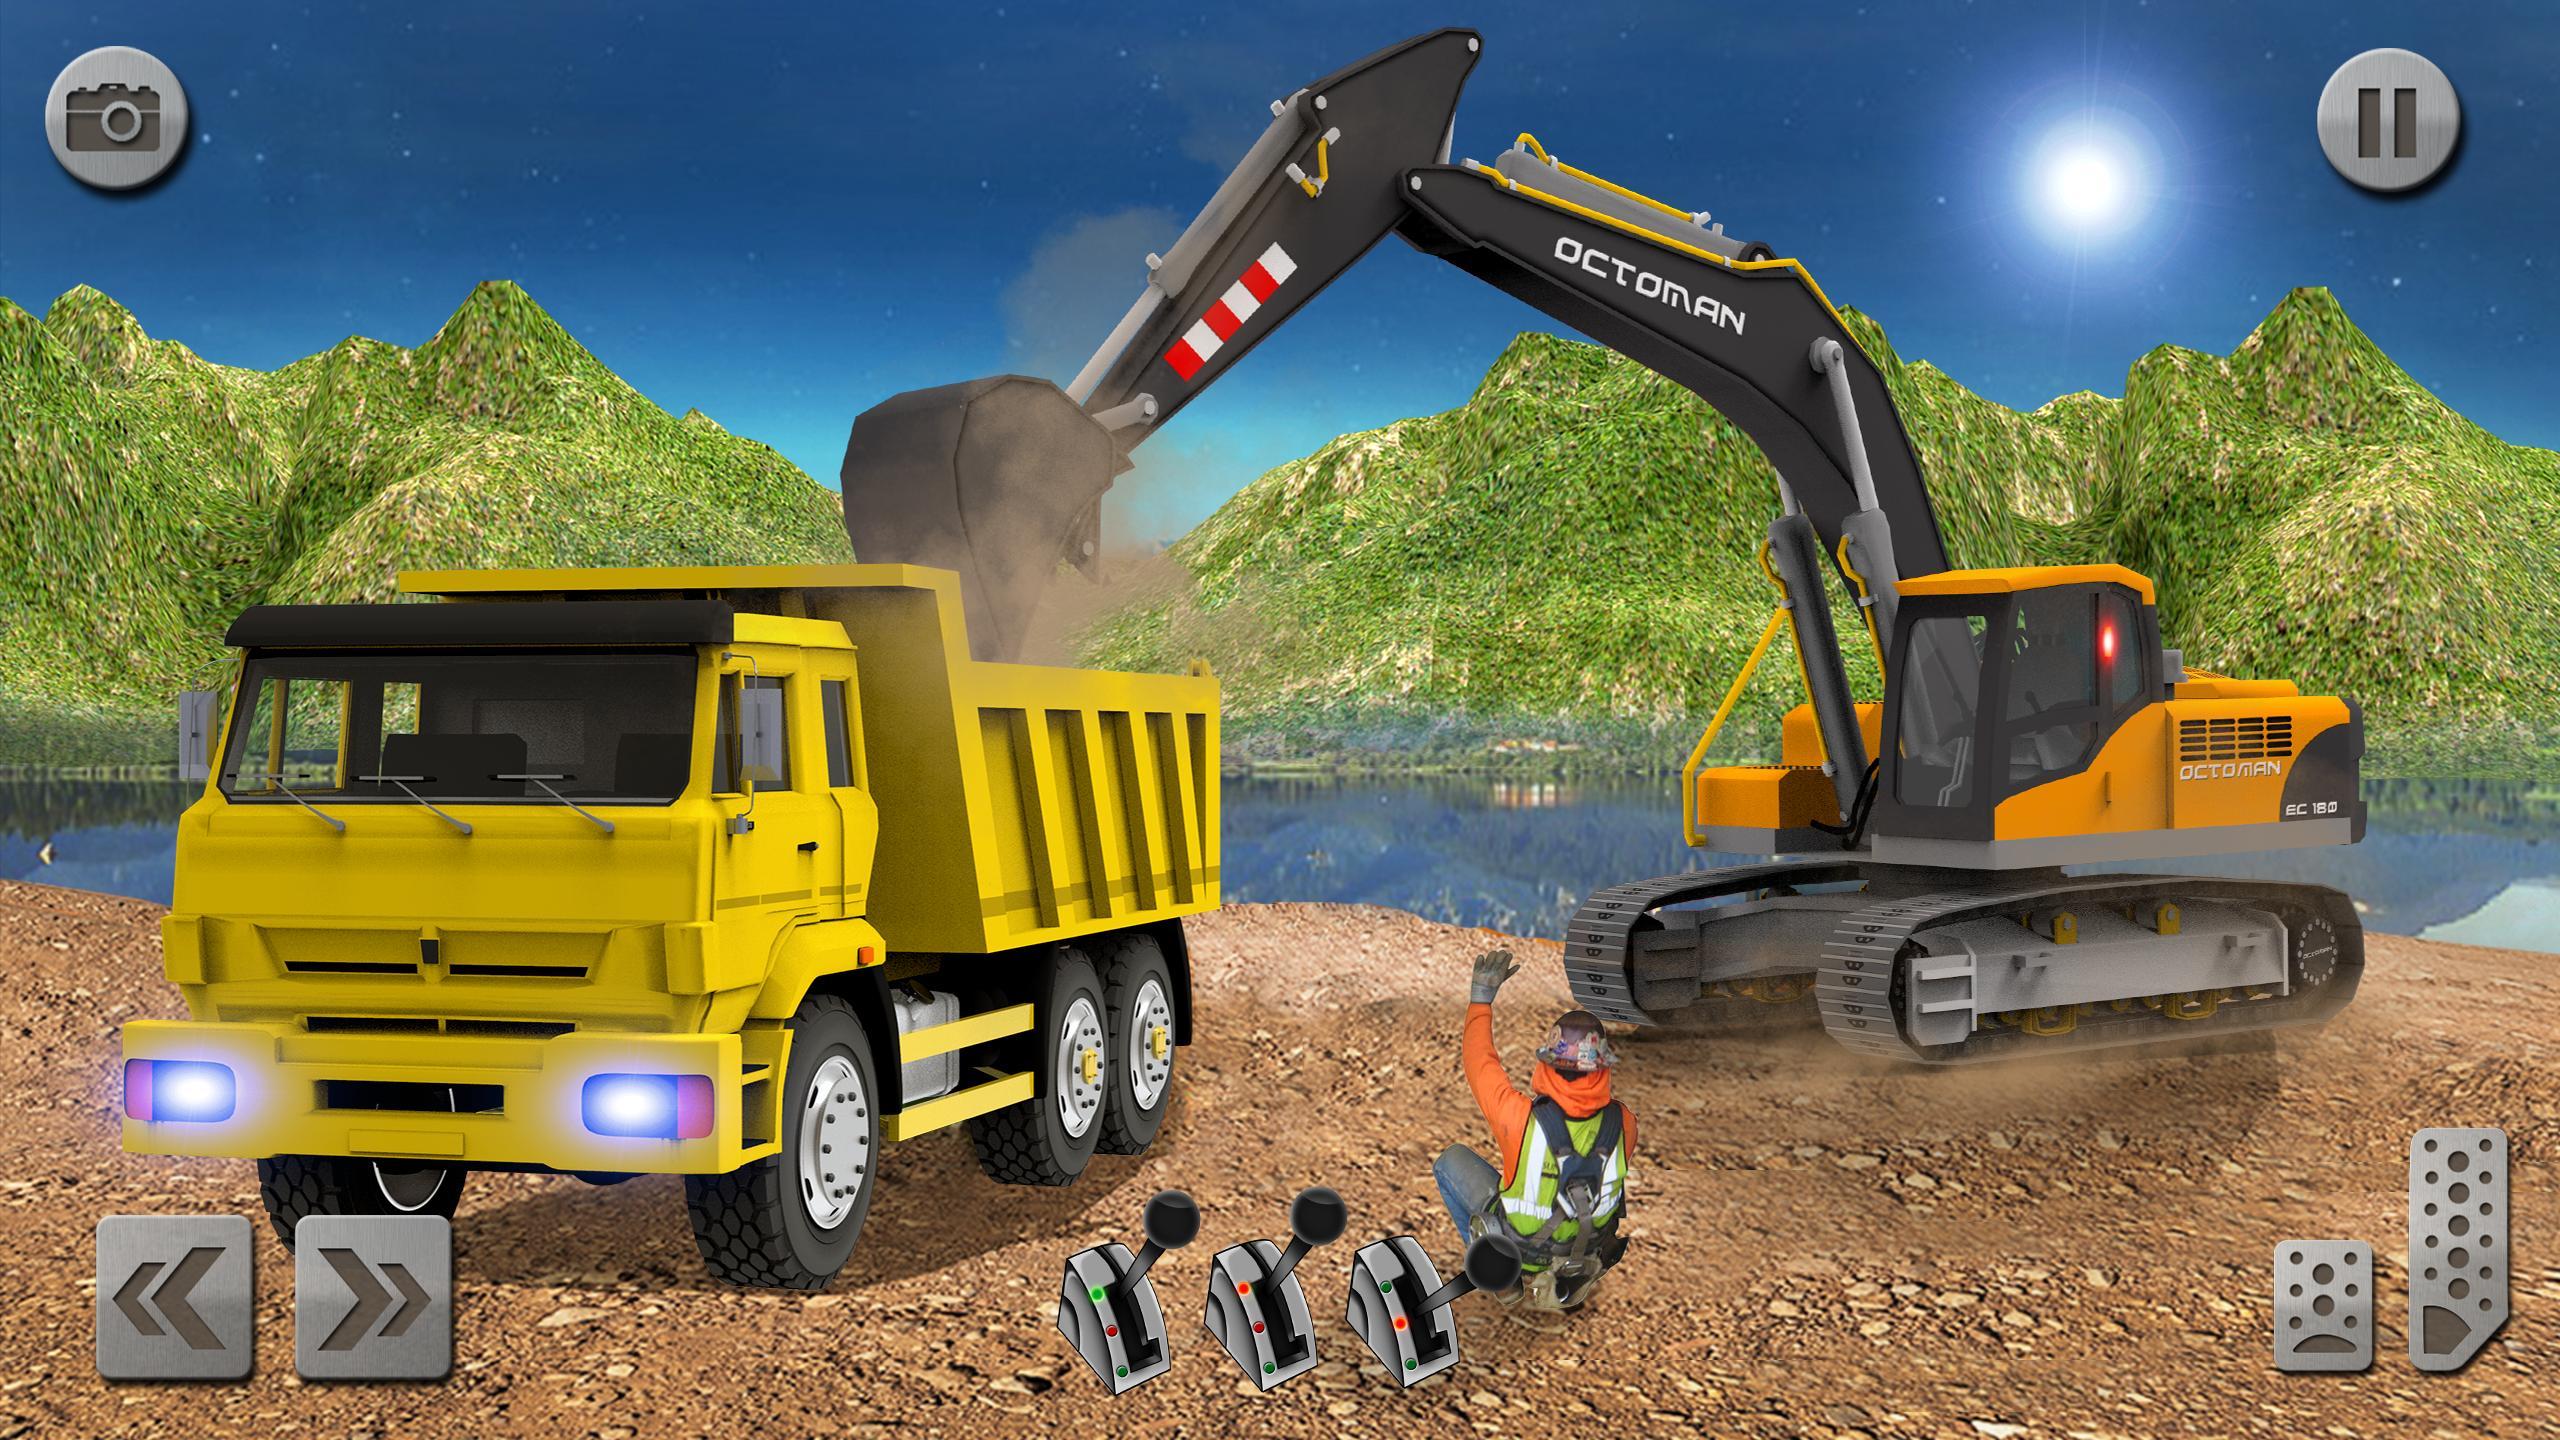 Sand Excavator Truck Driving Rescue Simulator game 5.2 Screenshot 23